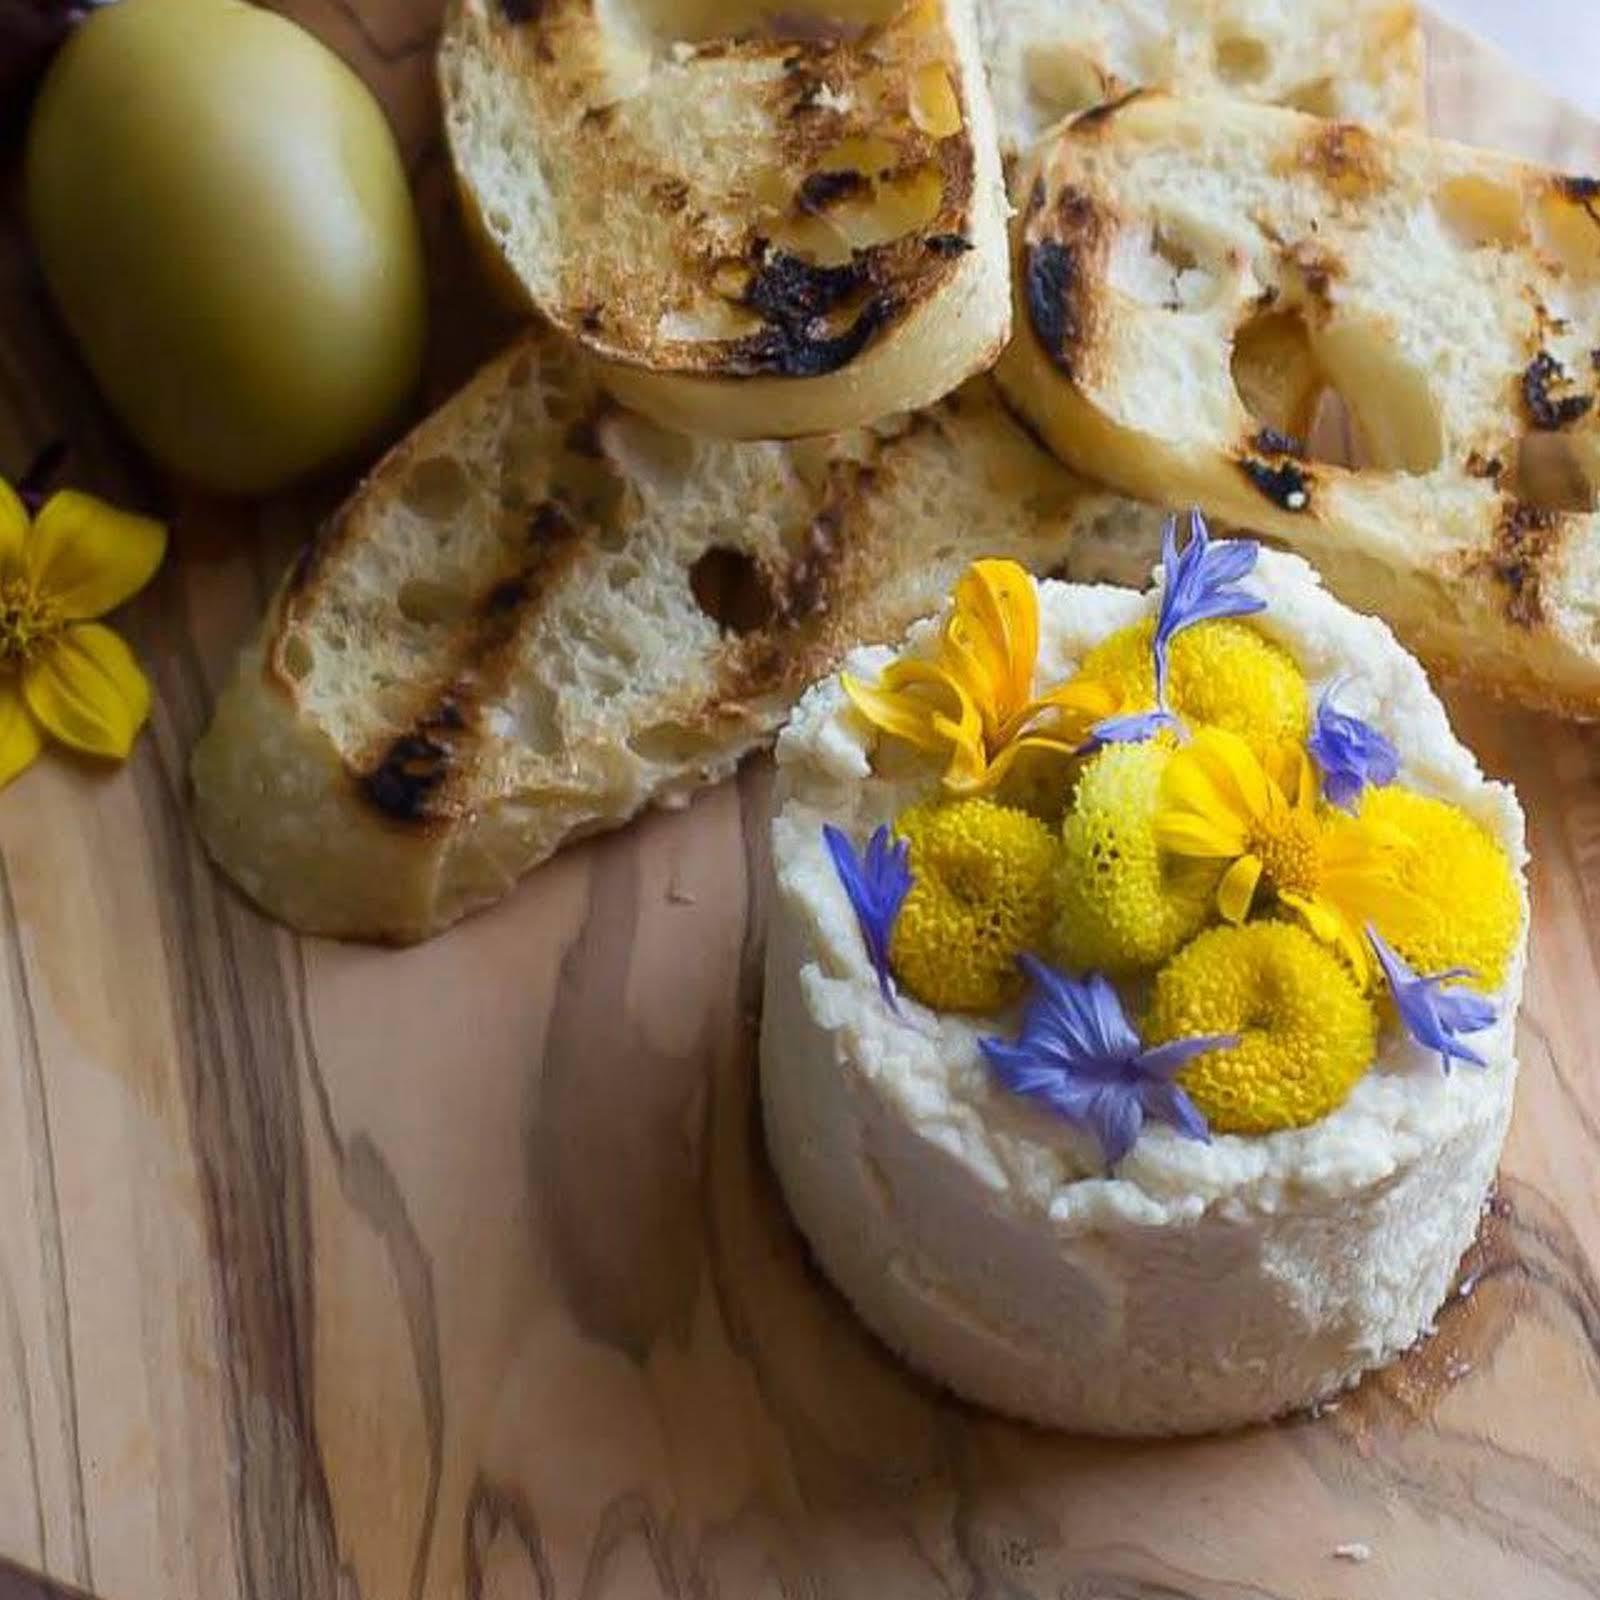 Macadamia 'Goat' Cheese [Vegan, Grain-Free]